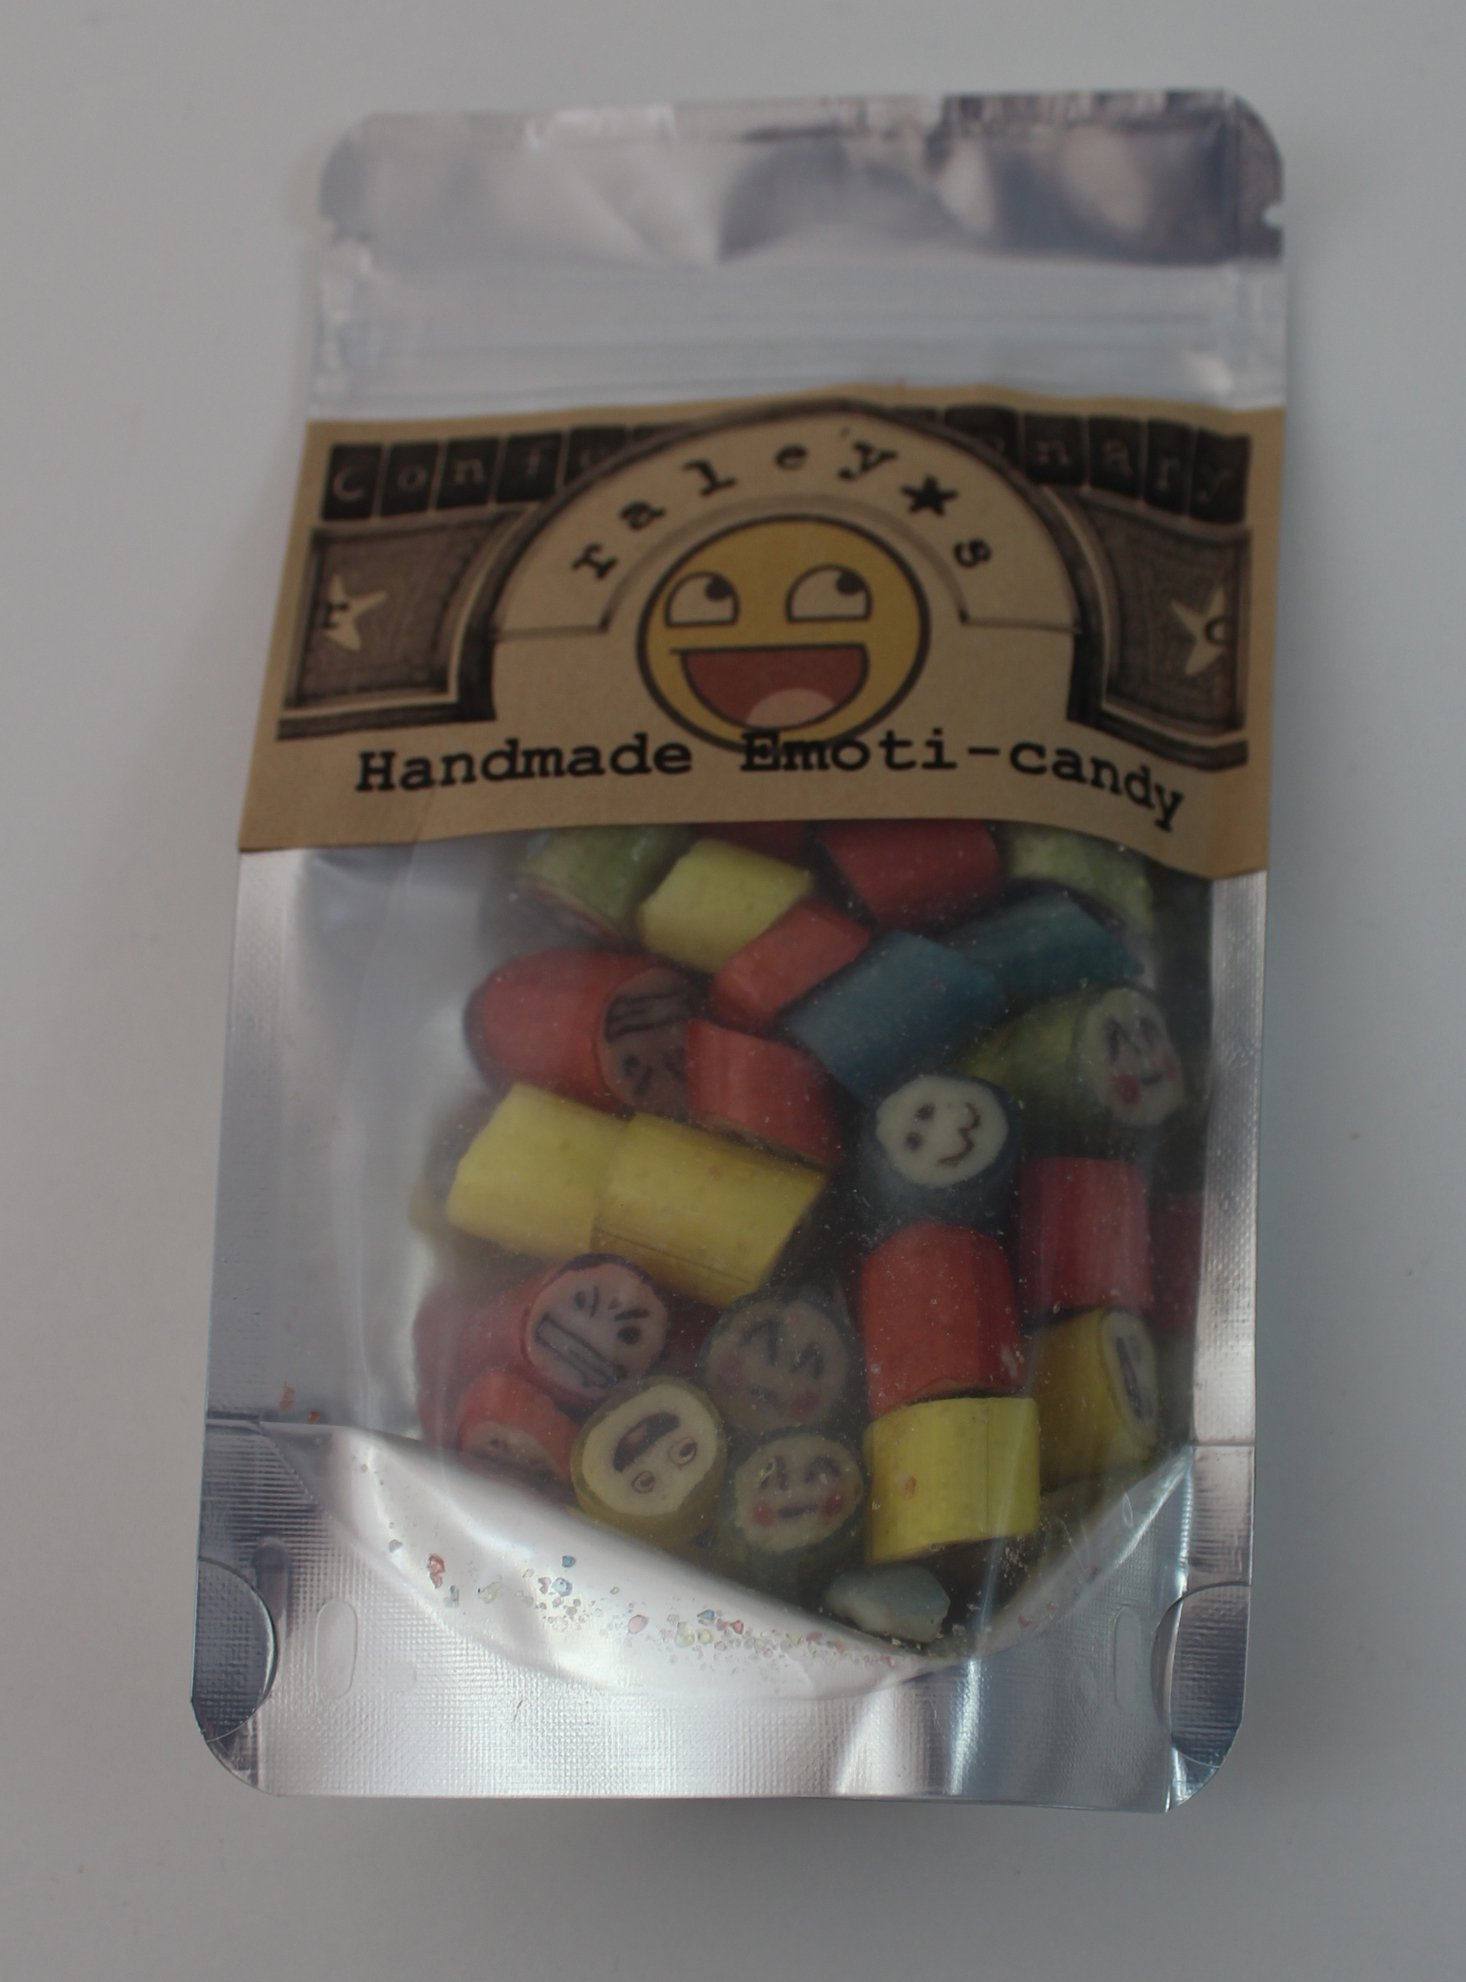 Raley's Handmade Emoti-Candy